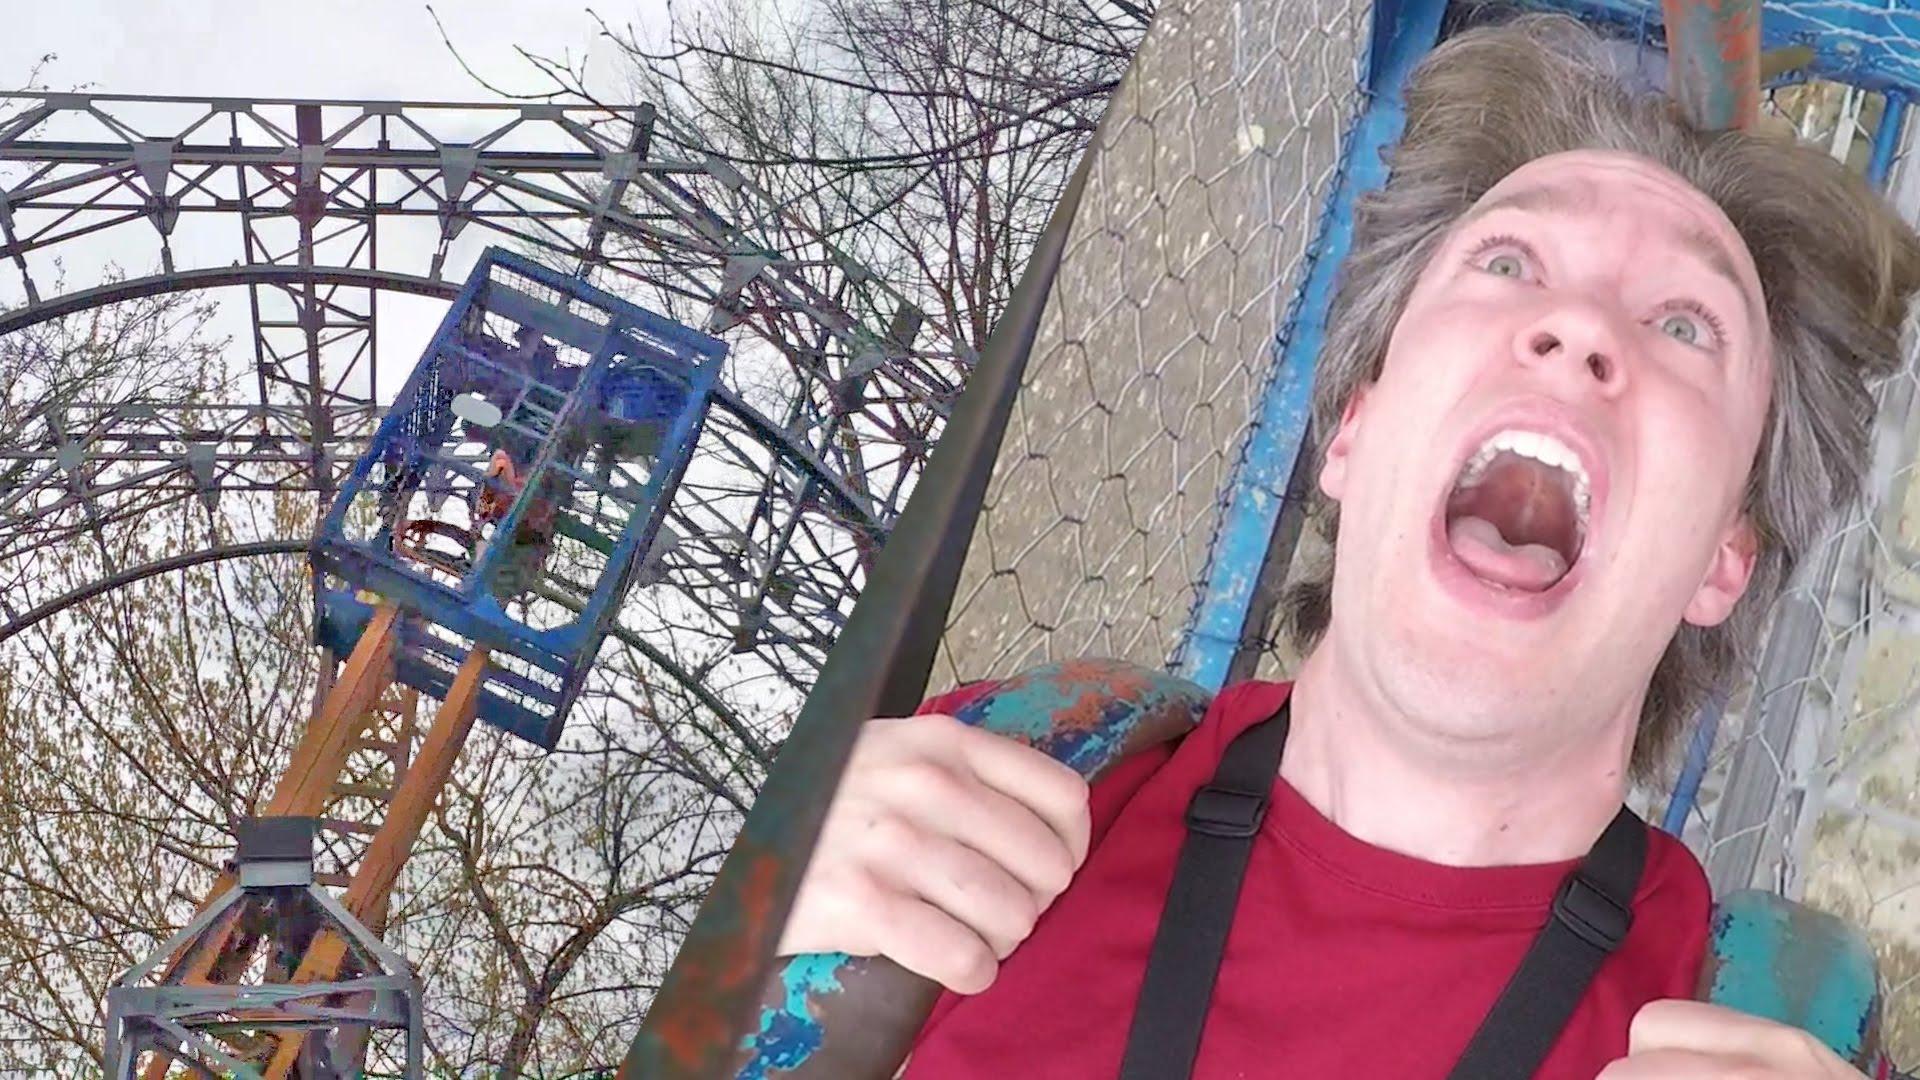 The Human-Powered Theme Park